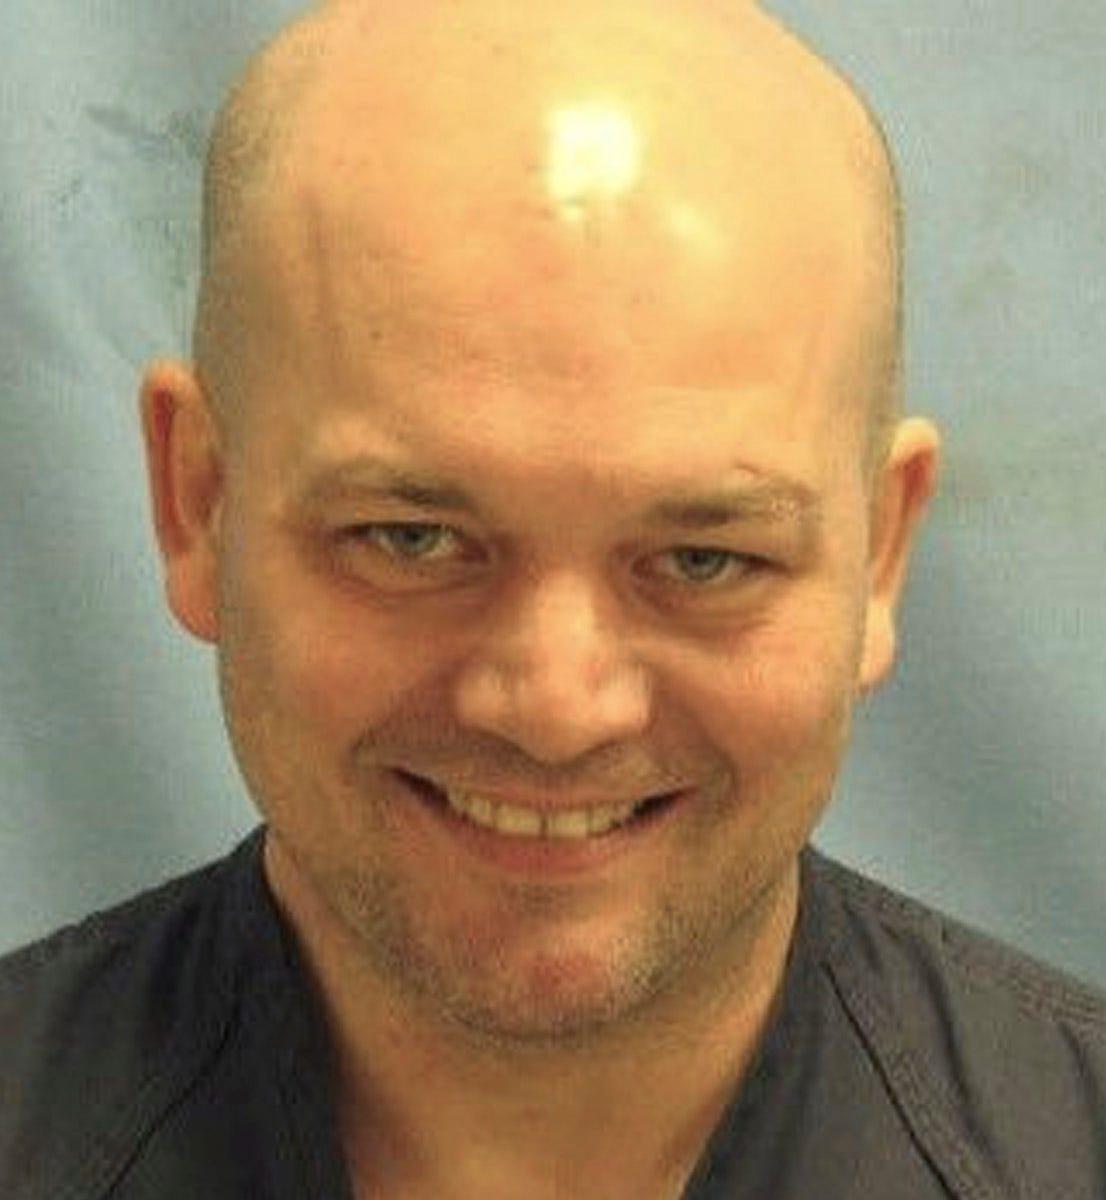 FBI: Man shot outside of Arkansas Air Force base dies - 635701637772182583-Air-Force-Base-Gate-S-Weig